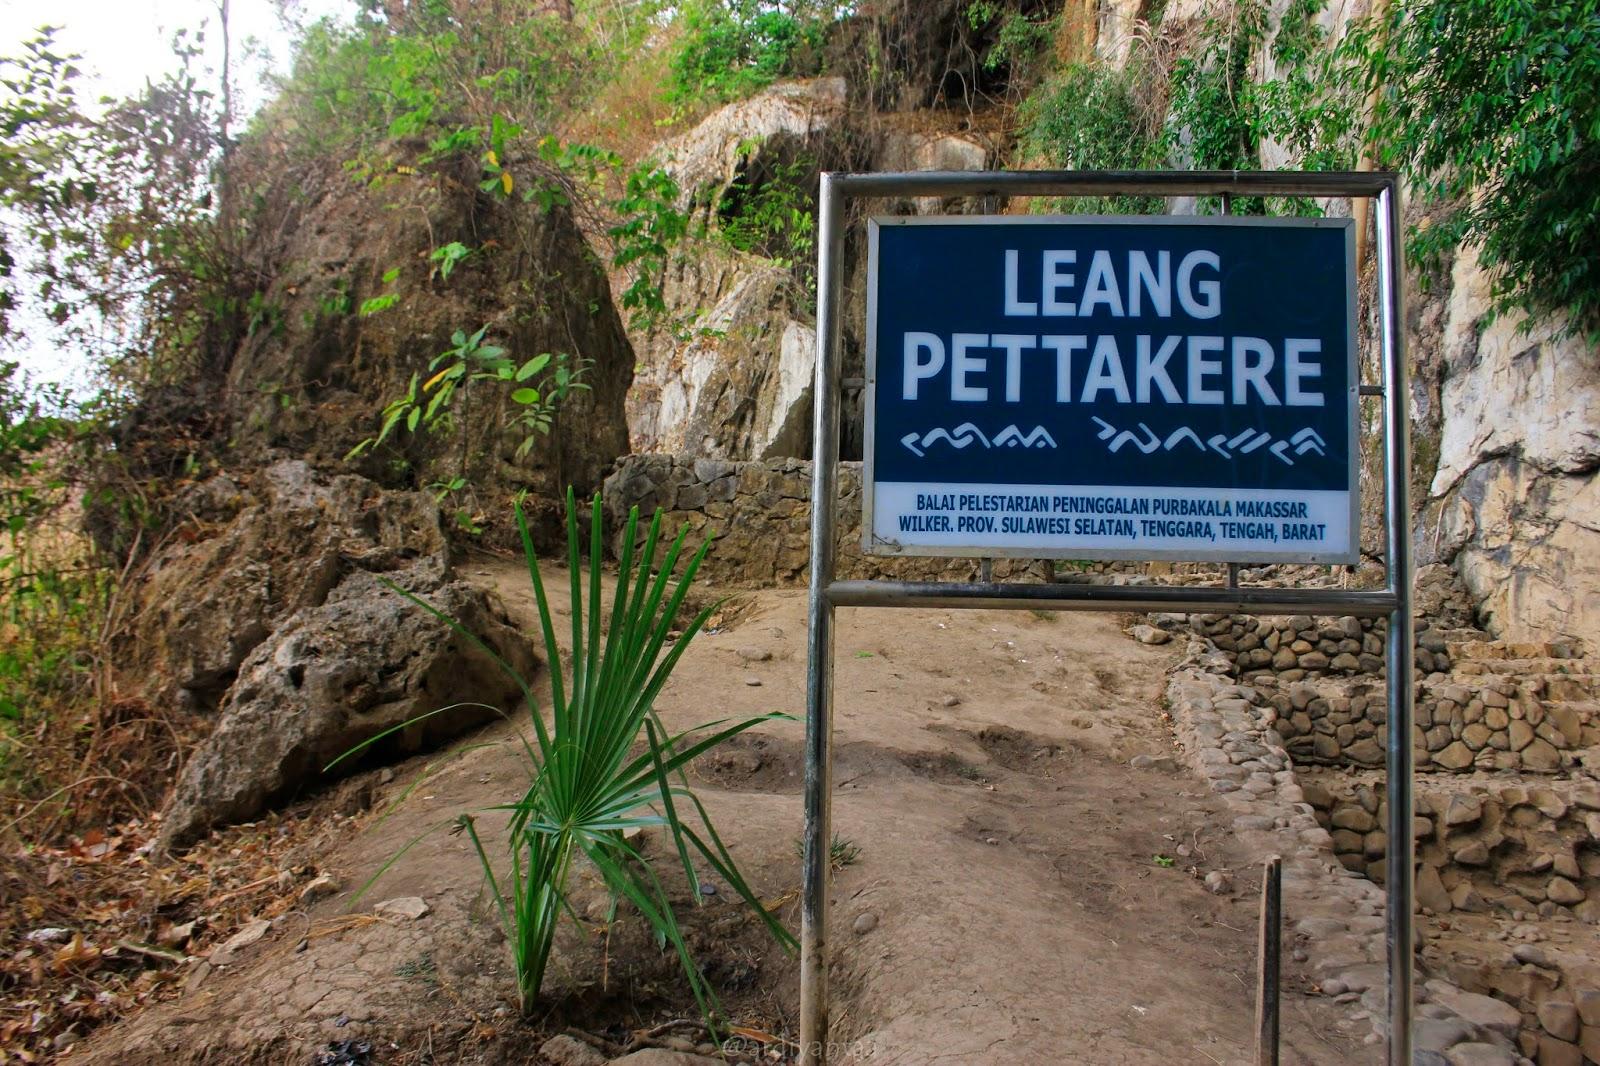 Terlempar Silam Taman Purbakala Leang Ardiyanta Satu Berada 300 Sebelah